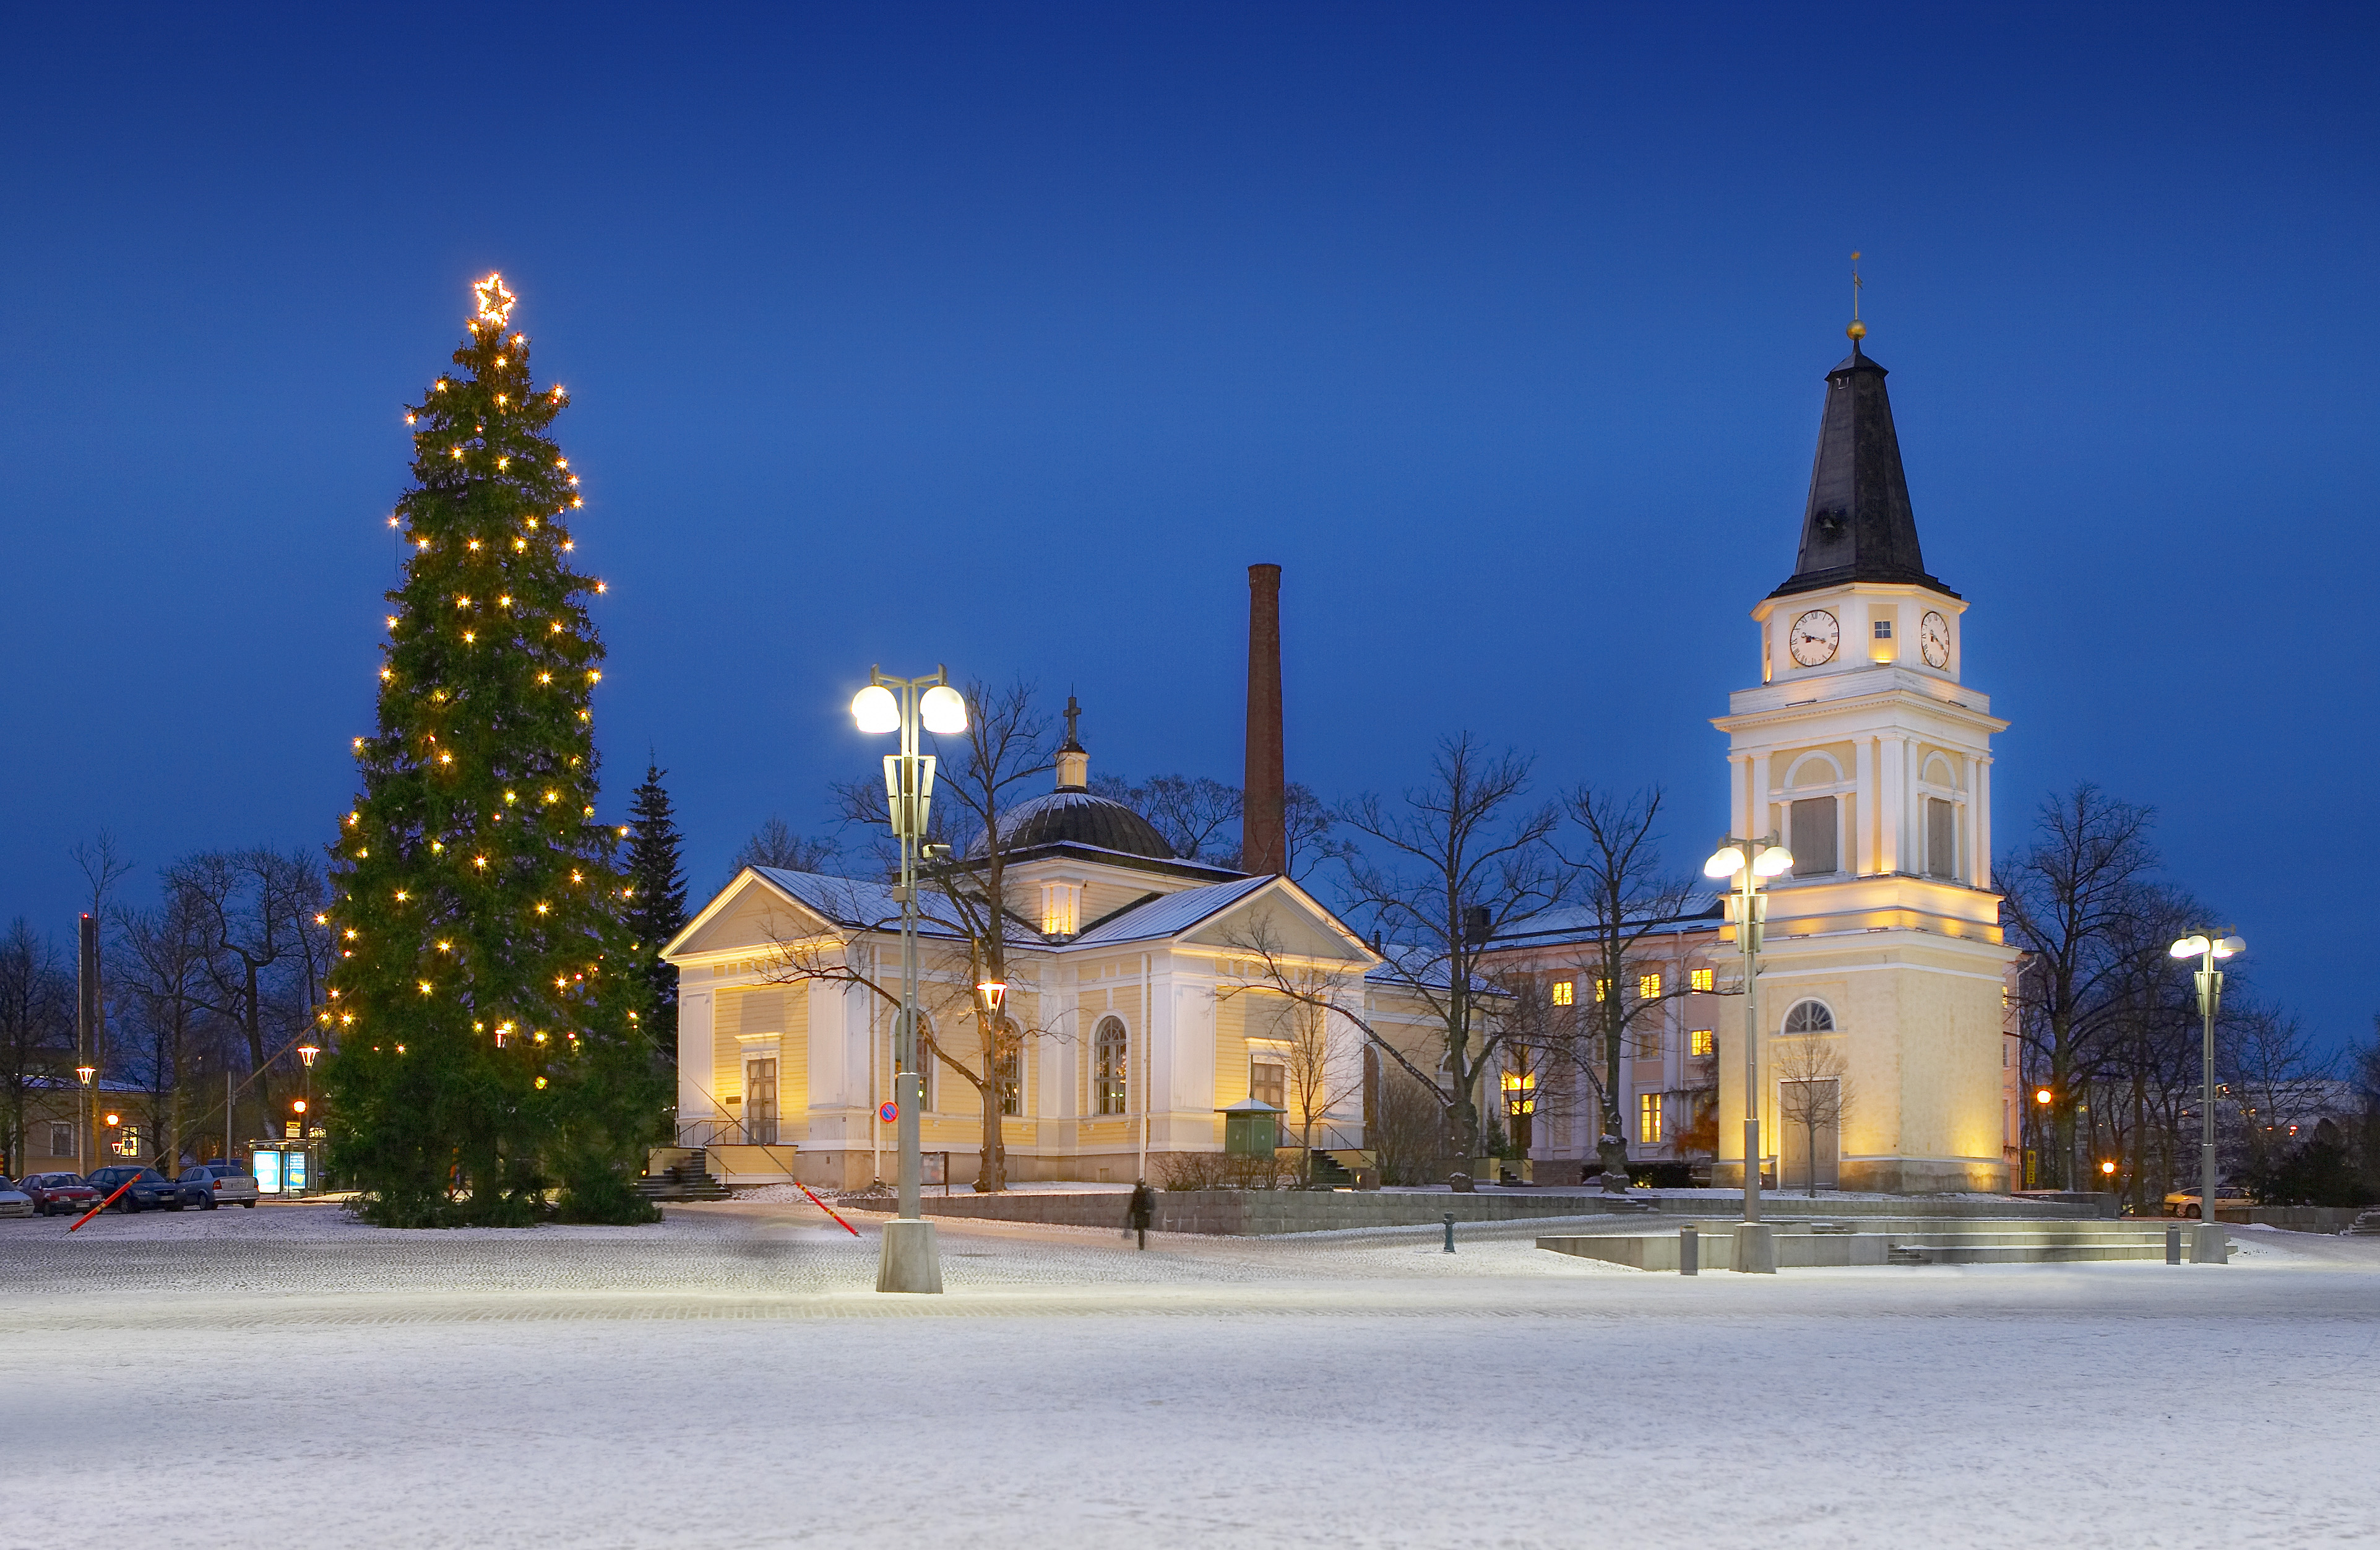 Vanha kirkko (Tampere) – Wikipedia